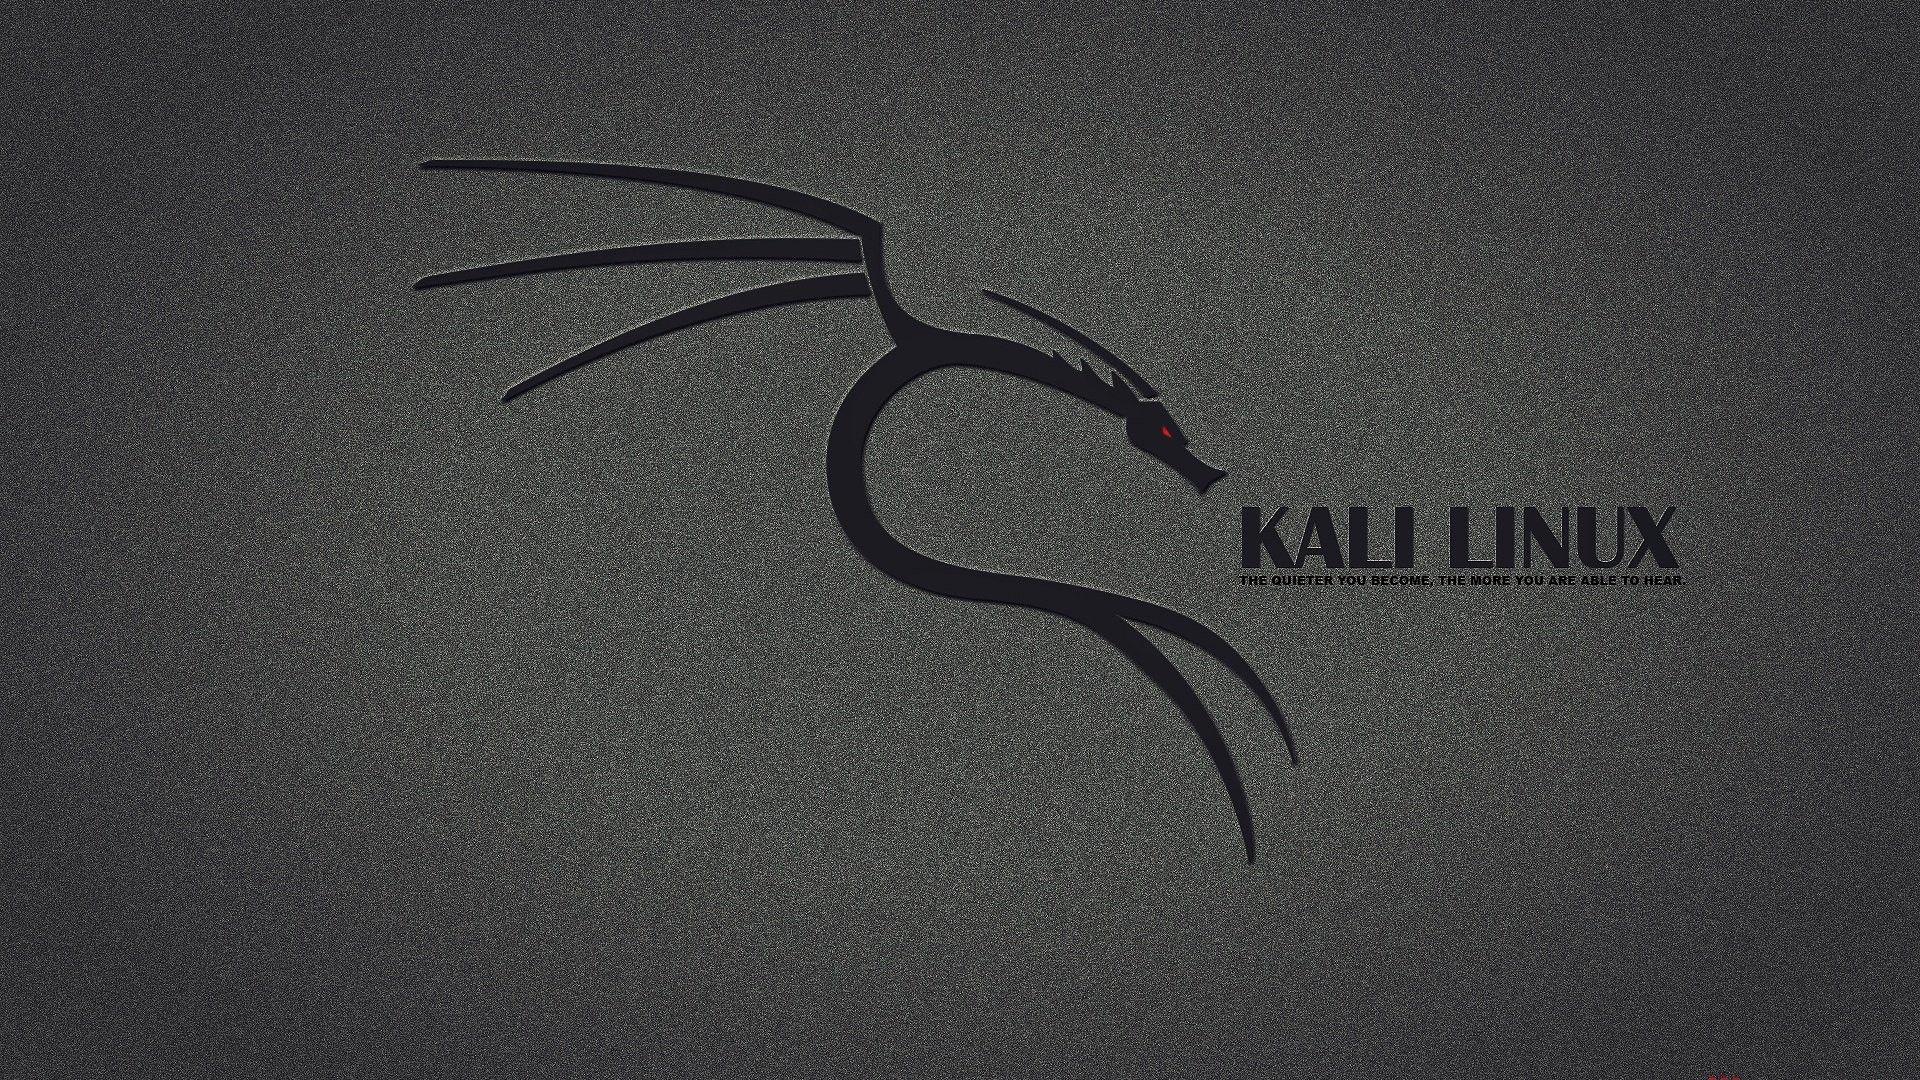 Kali Linux Wallpapers 1920x1080 - Wallpaper Cave